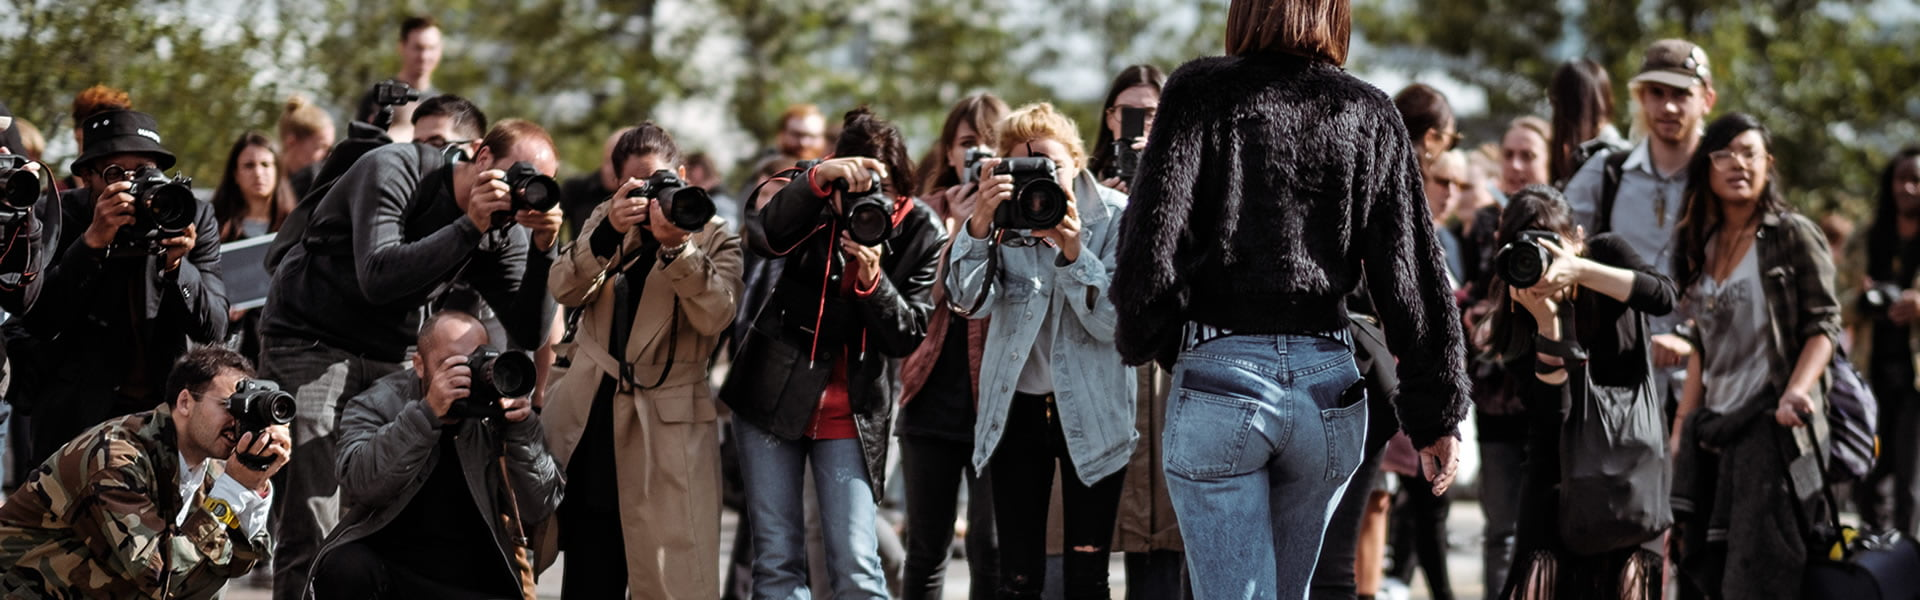 Paparazzi photographing model outside